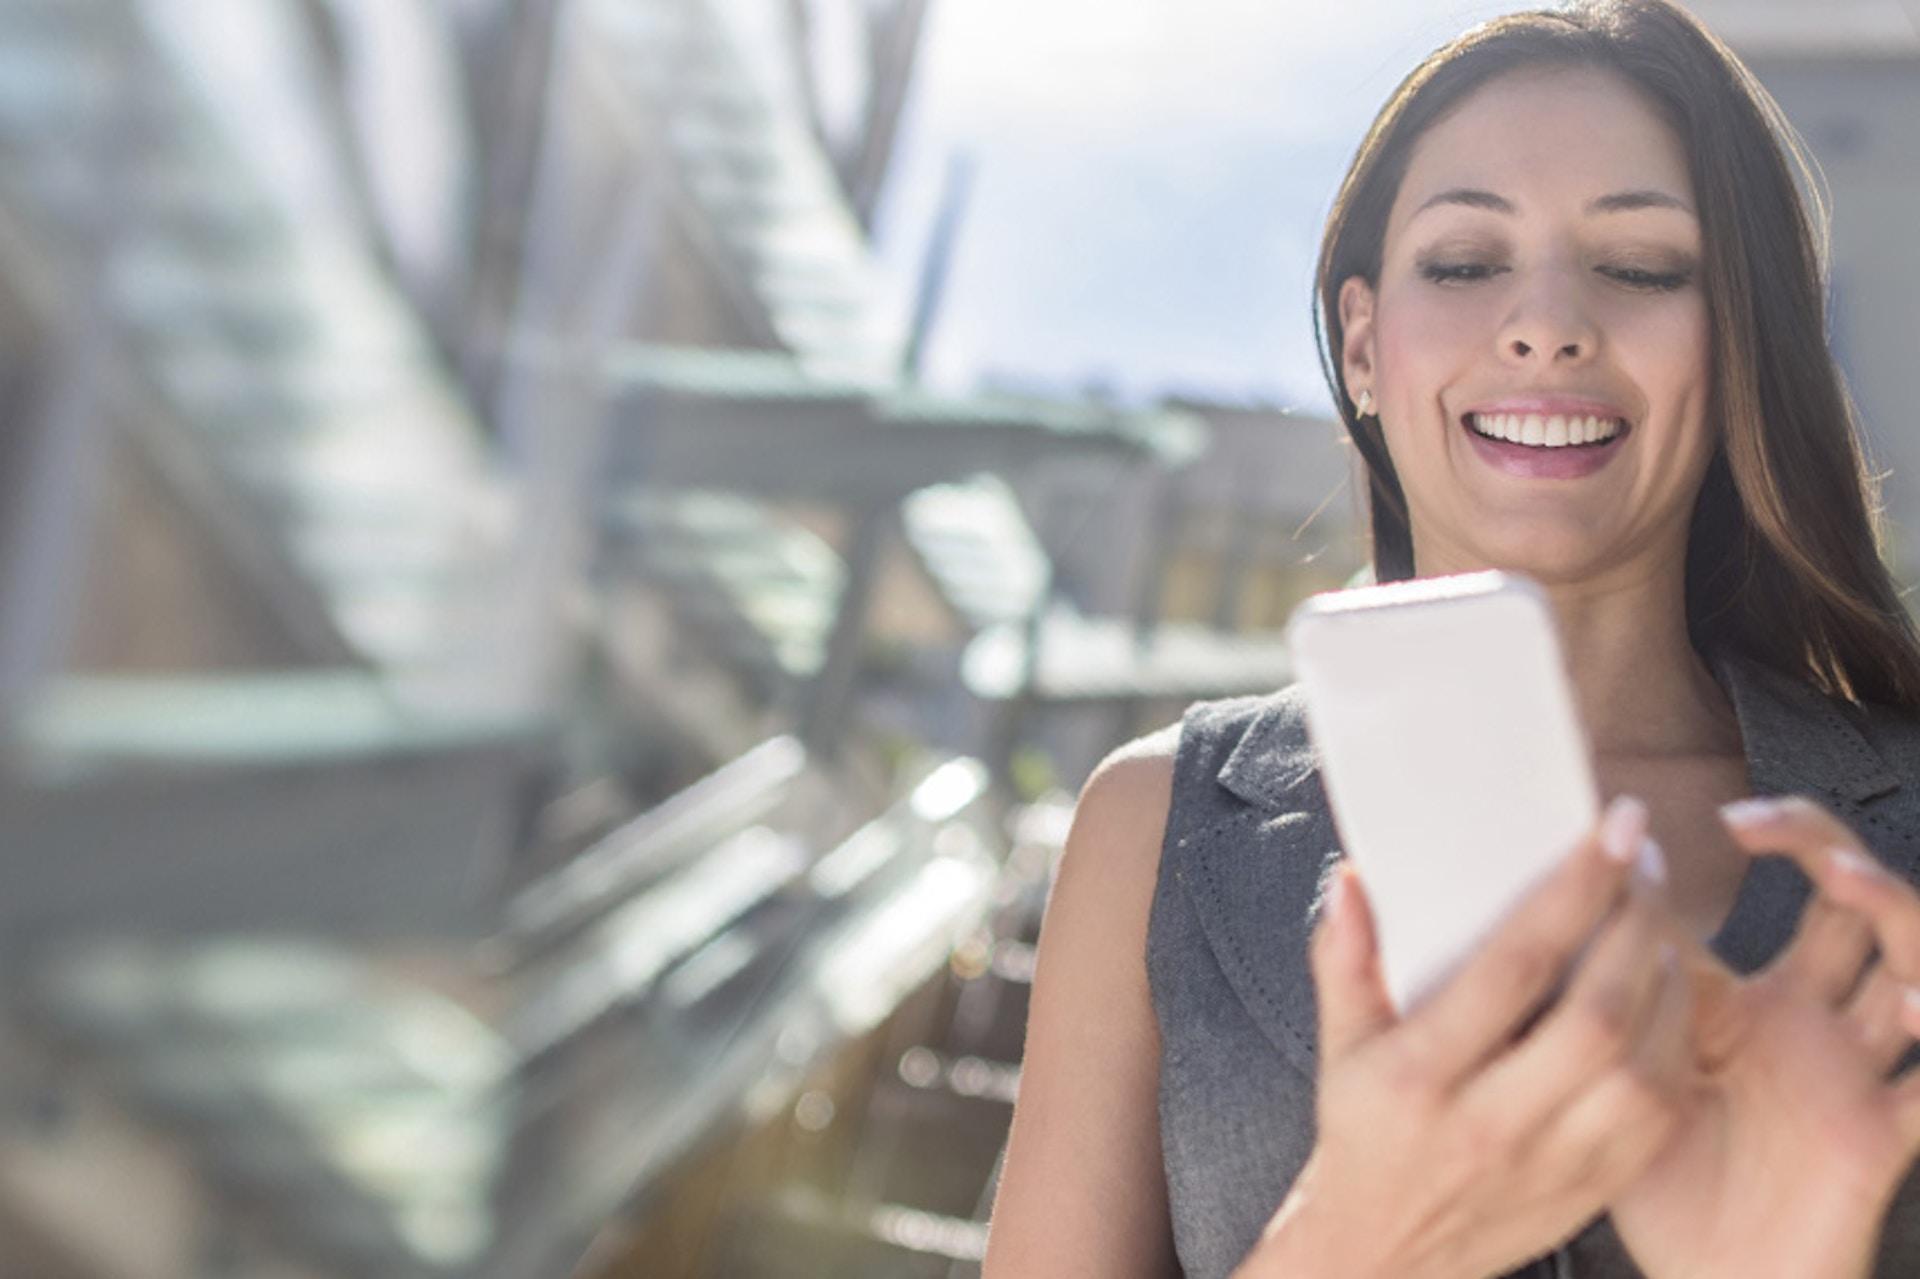 Social media phone use